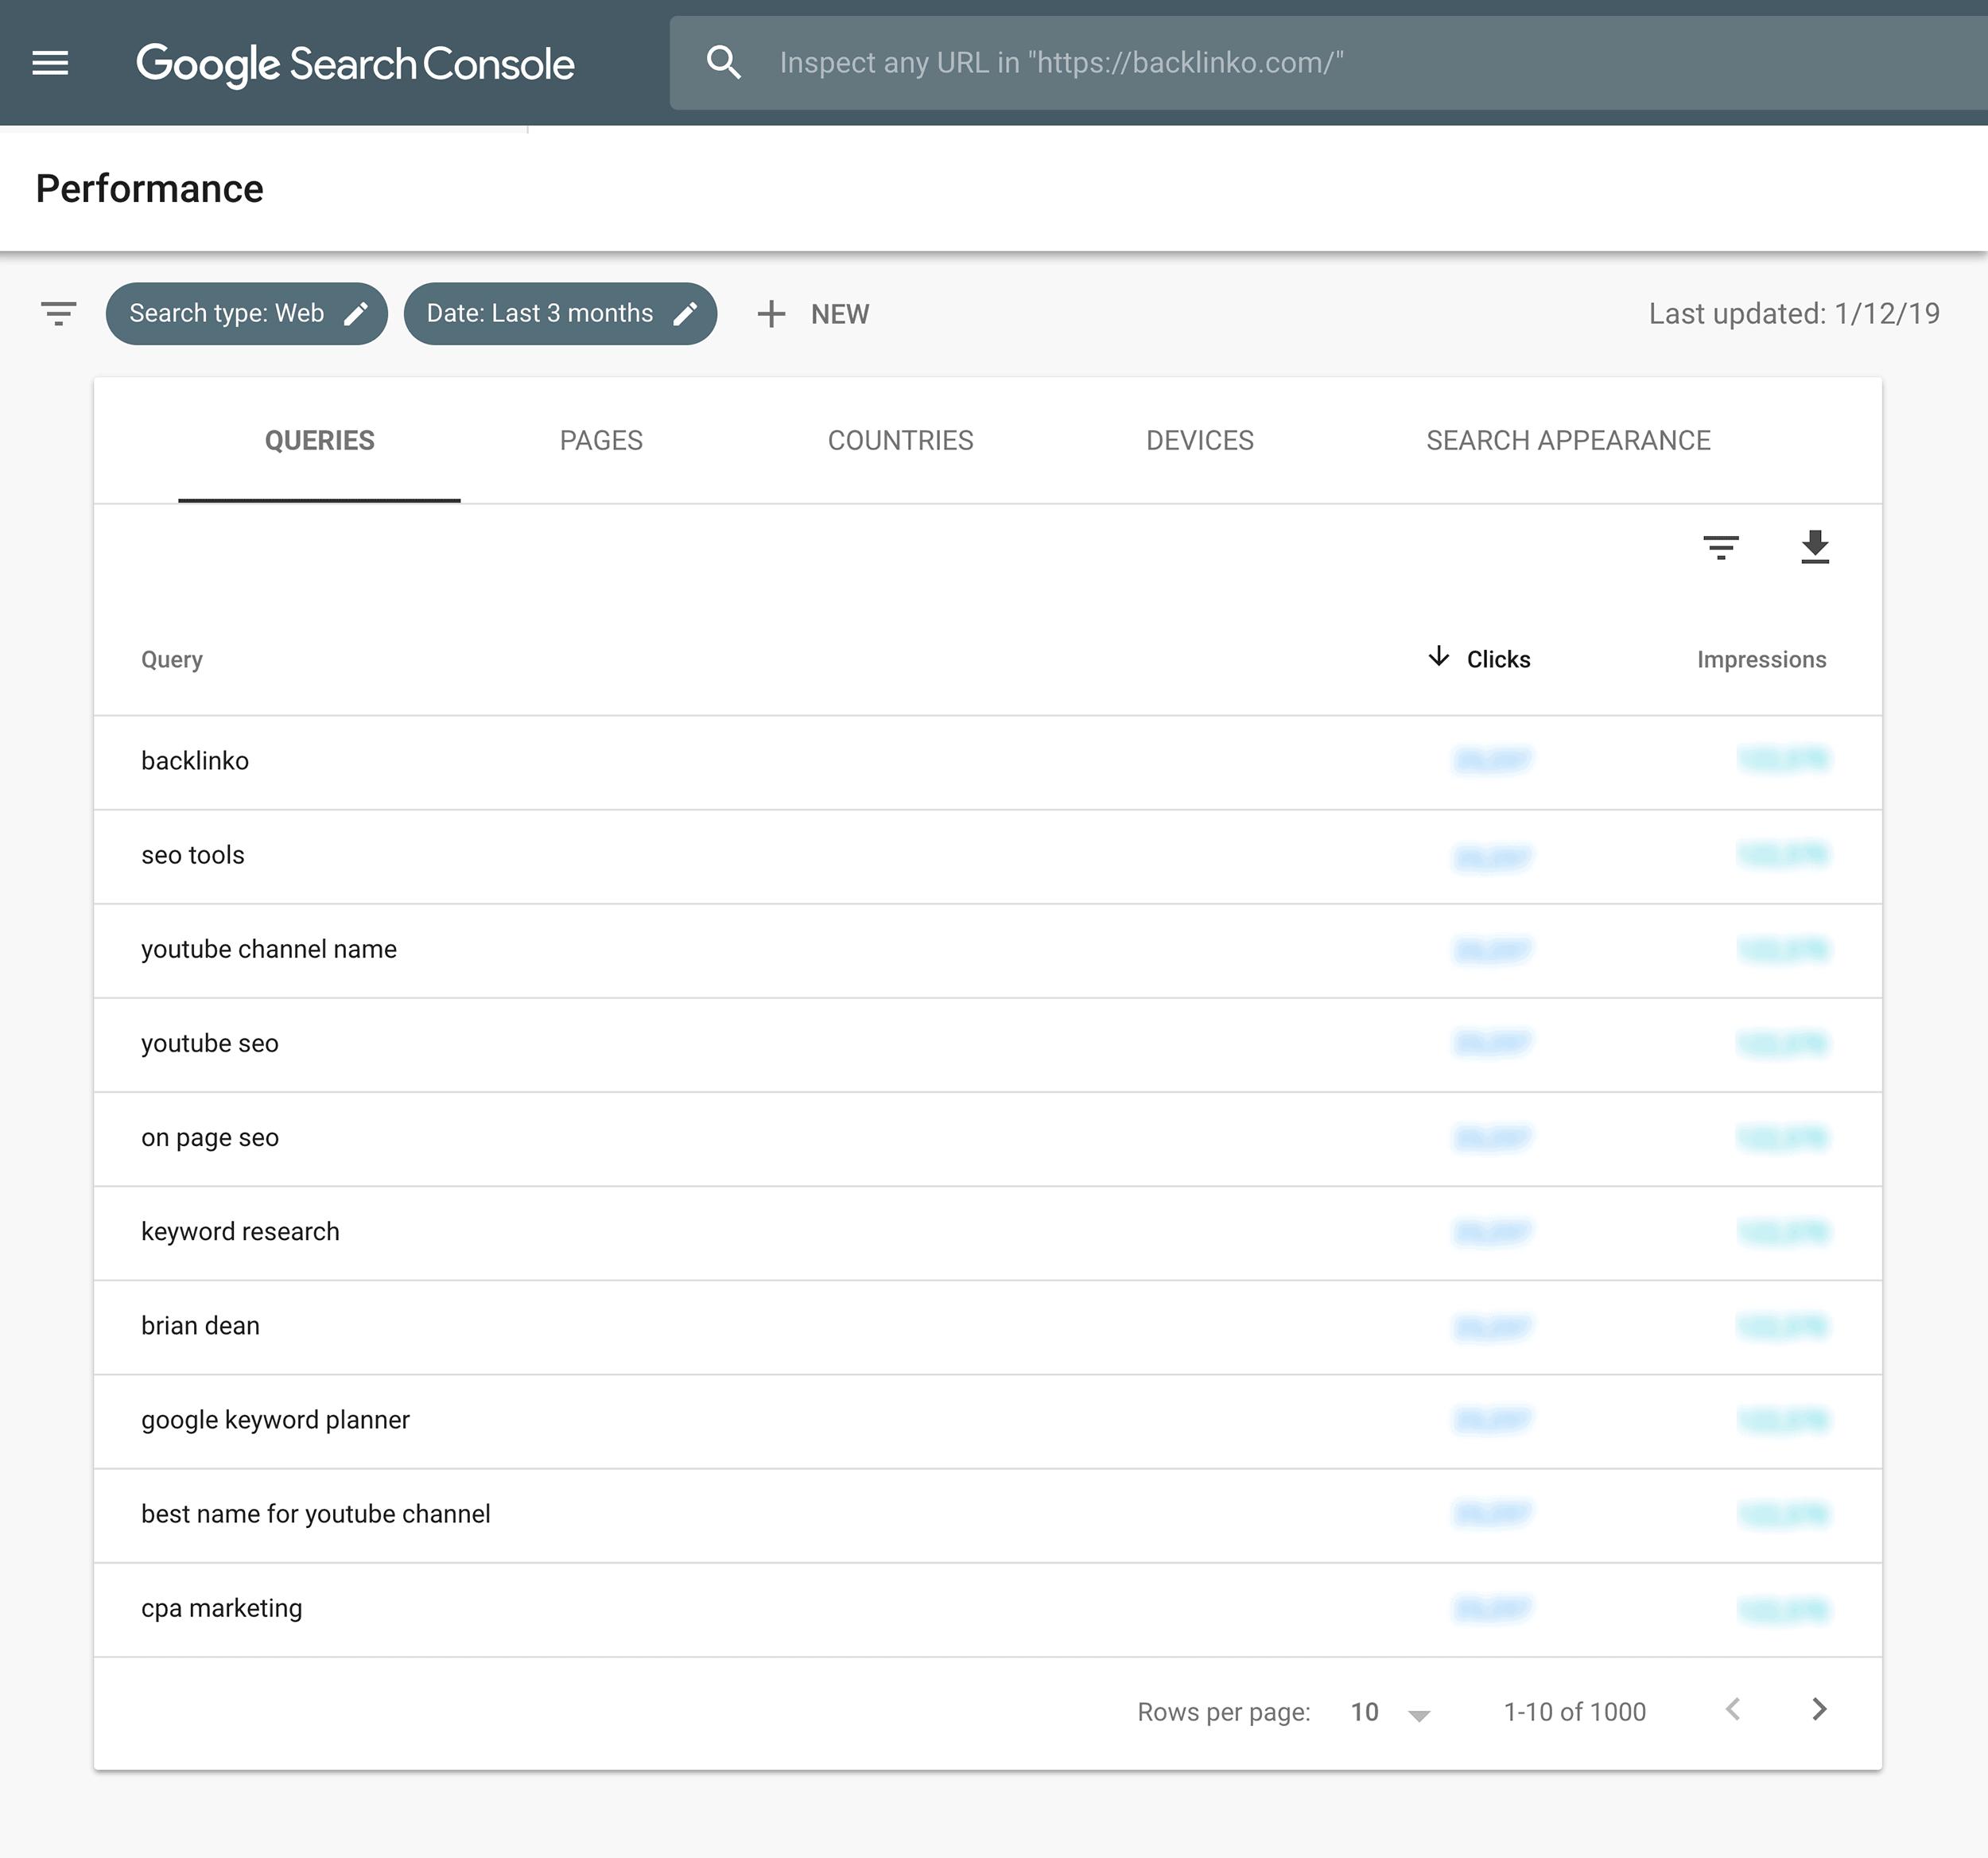 Using Google Search Console as a rank checker